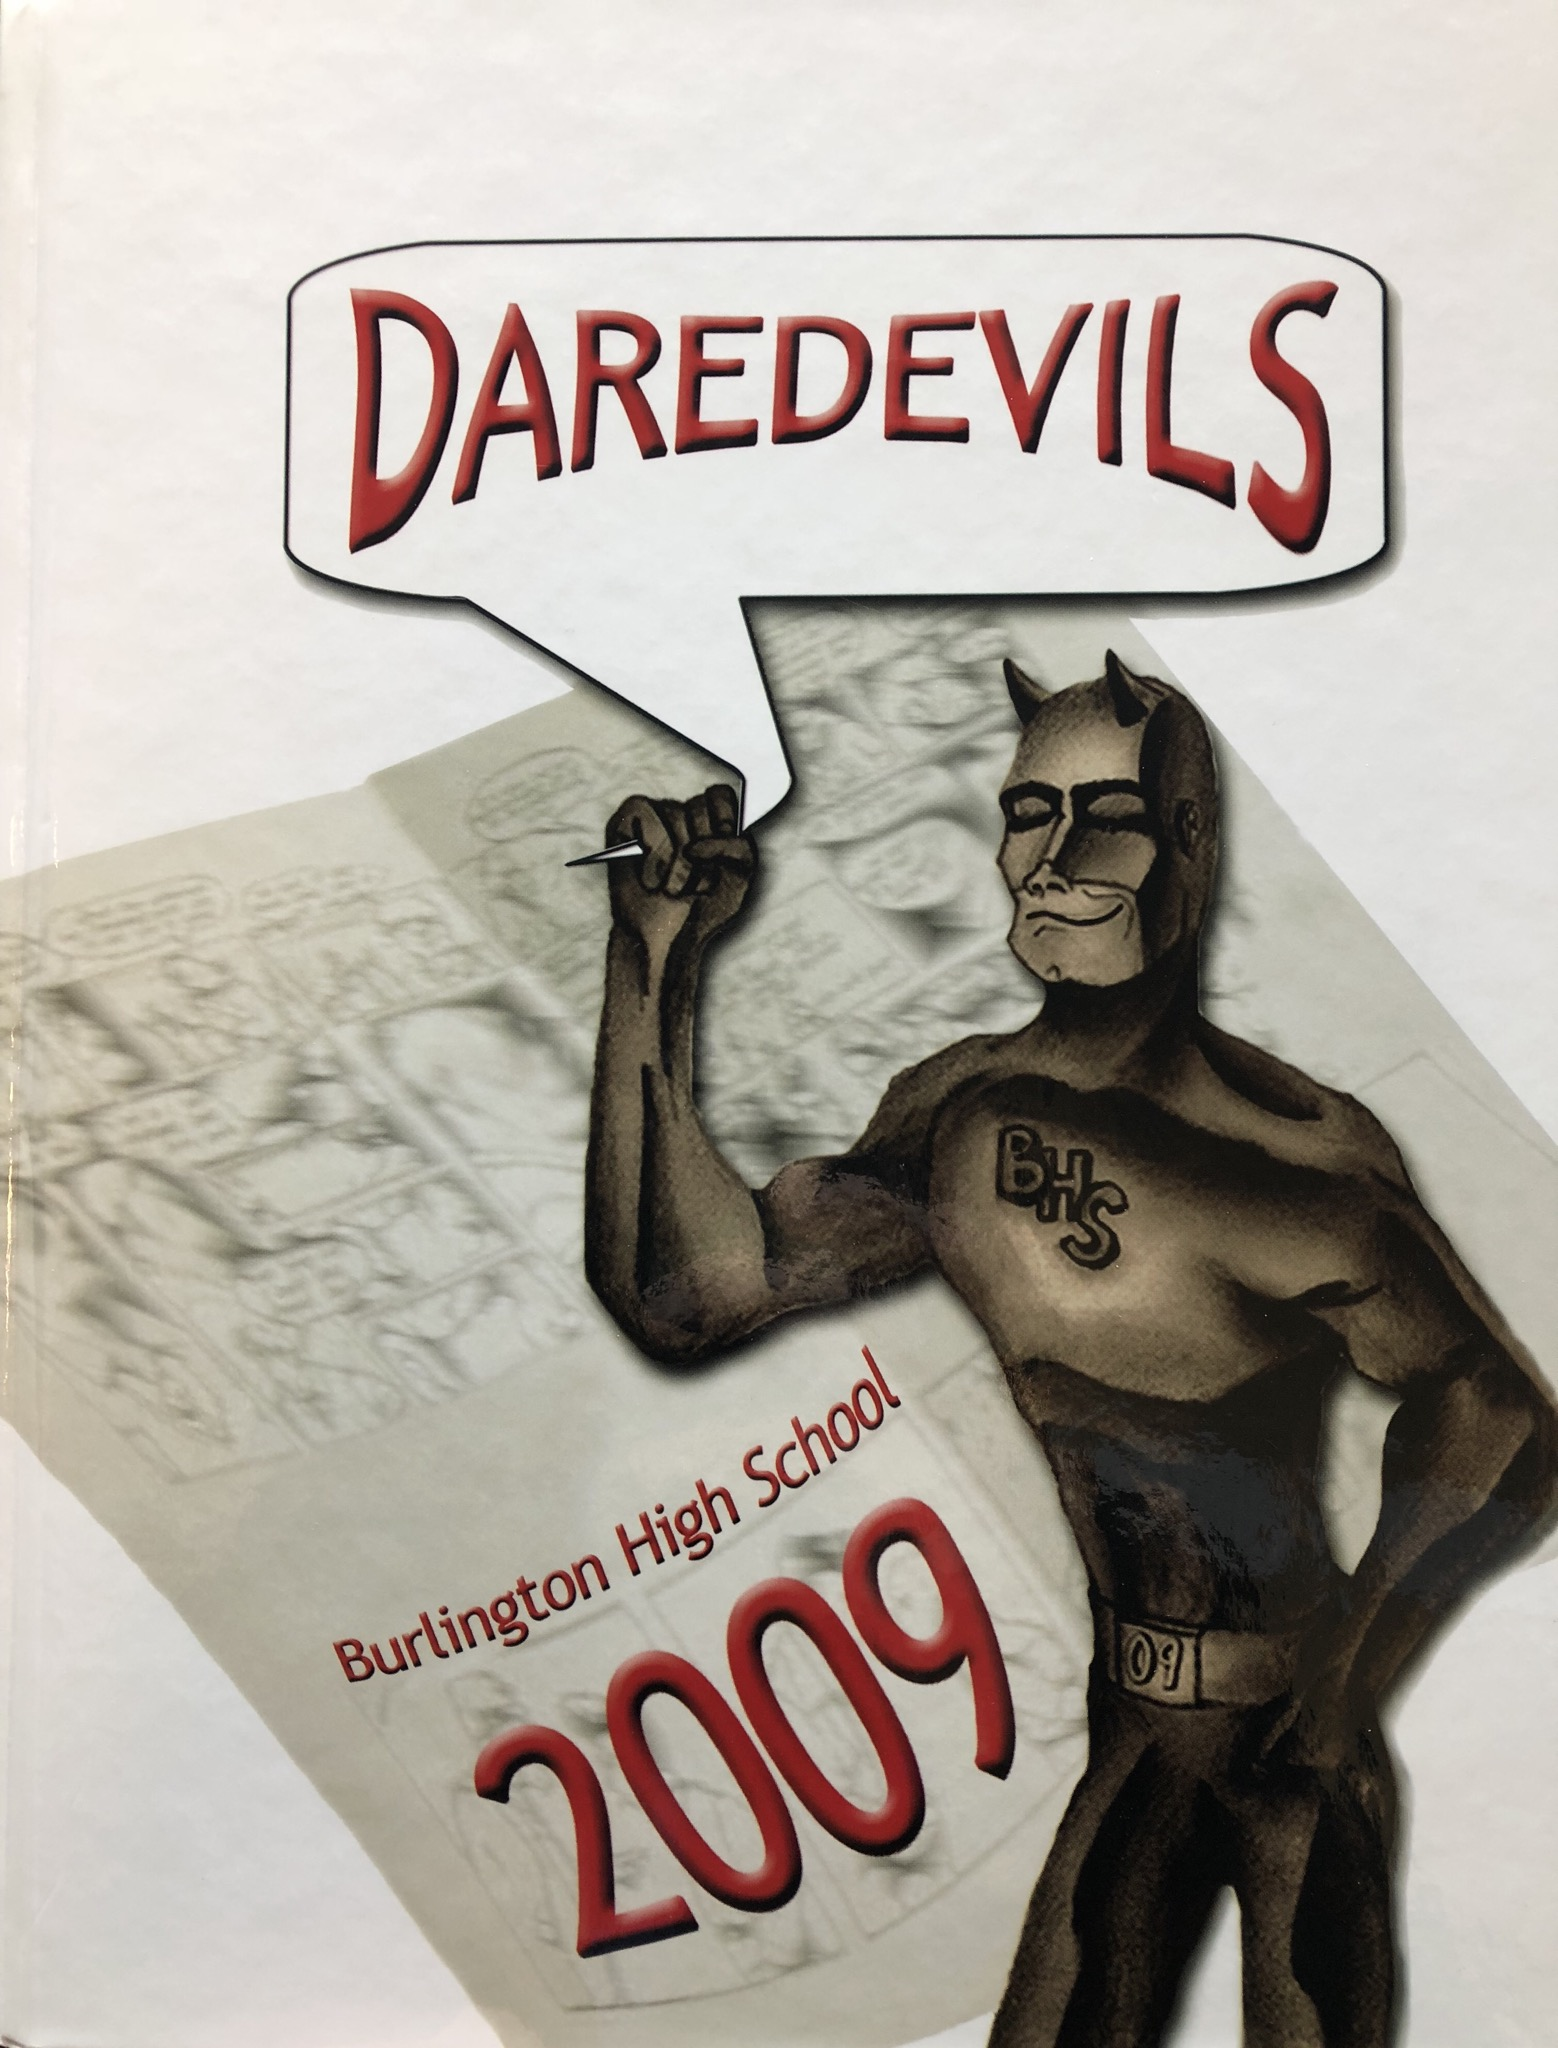 Class of 2009 Burlington MA High School yearbook cover